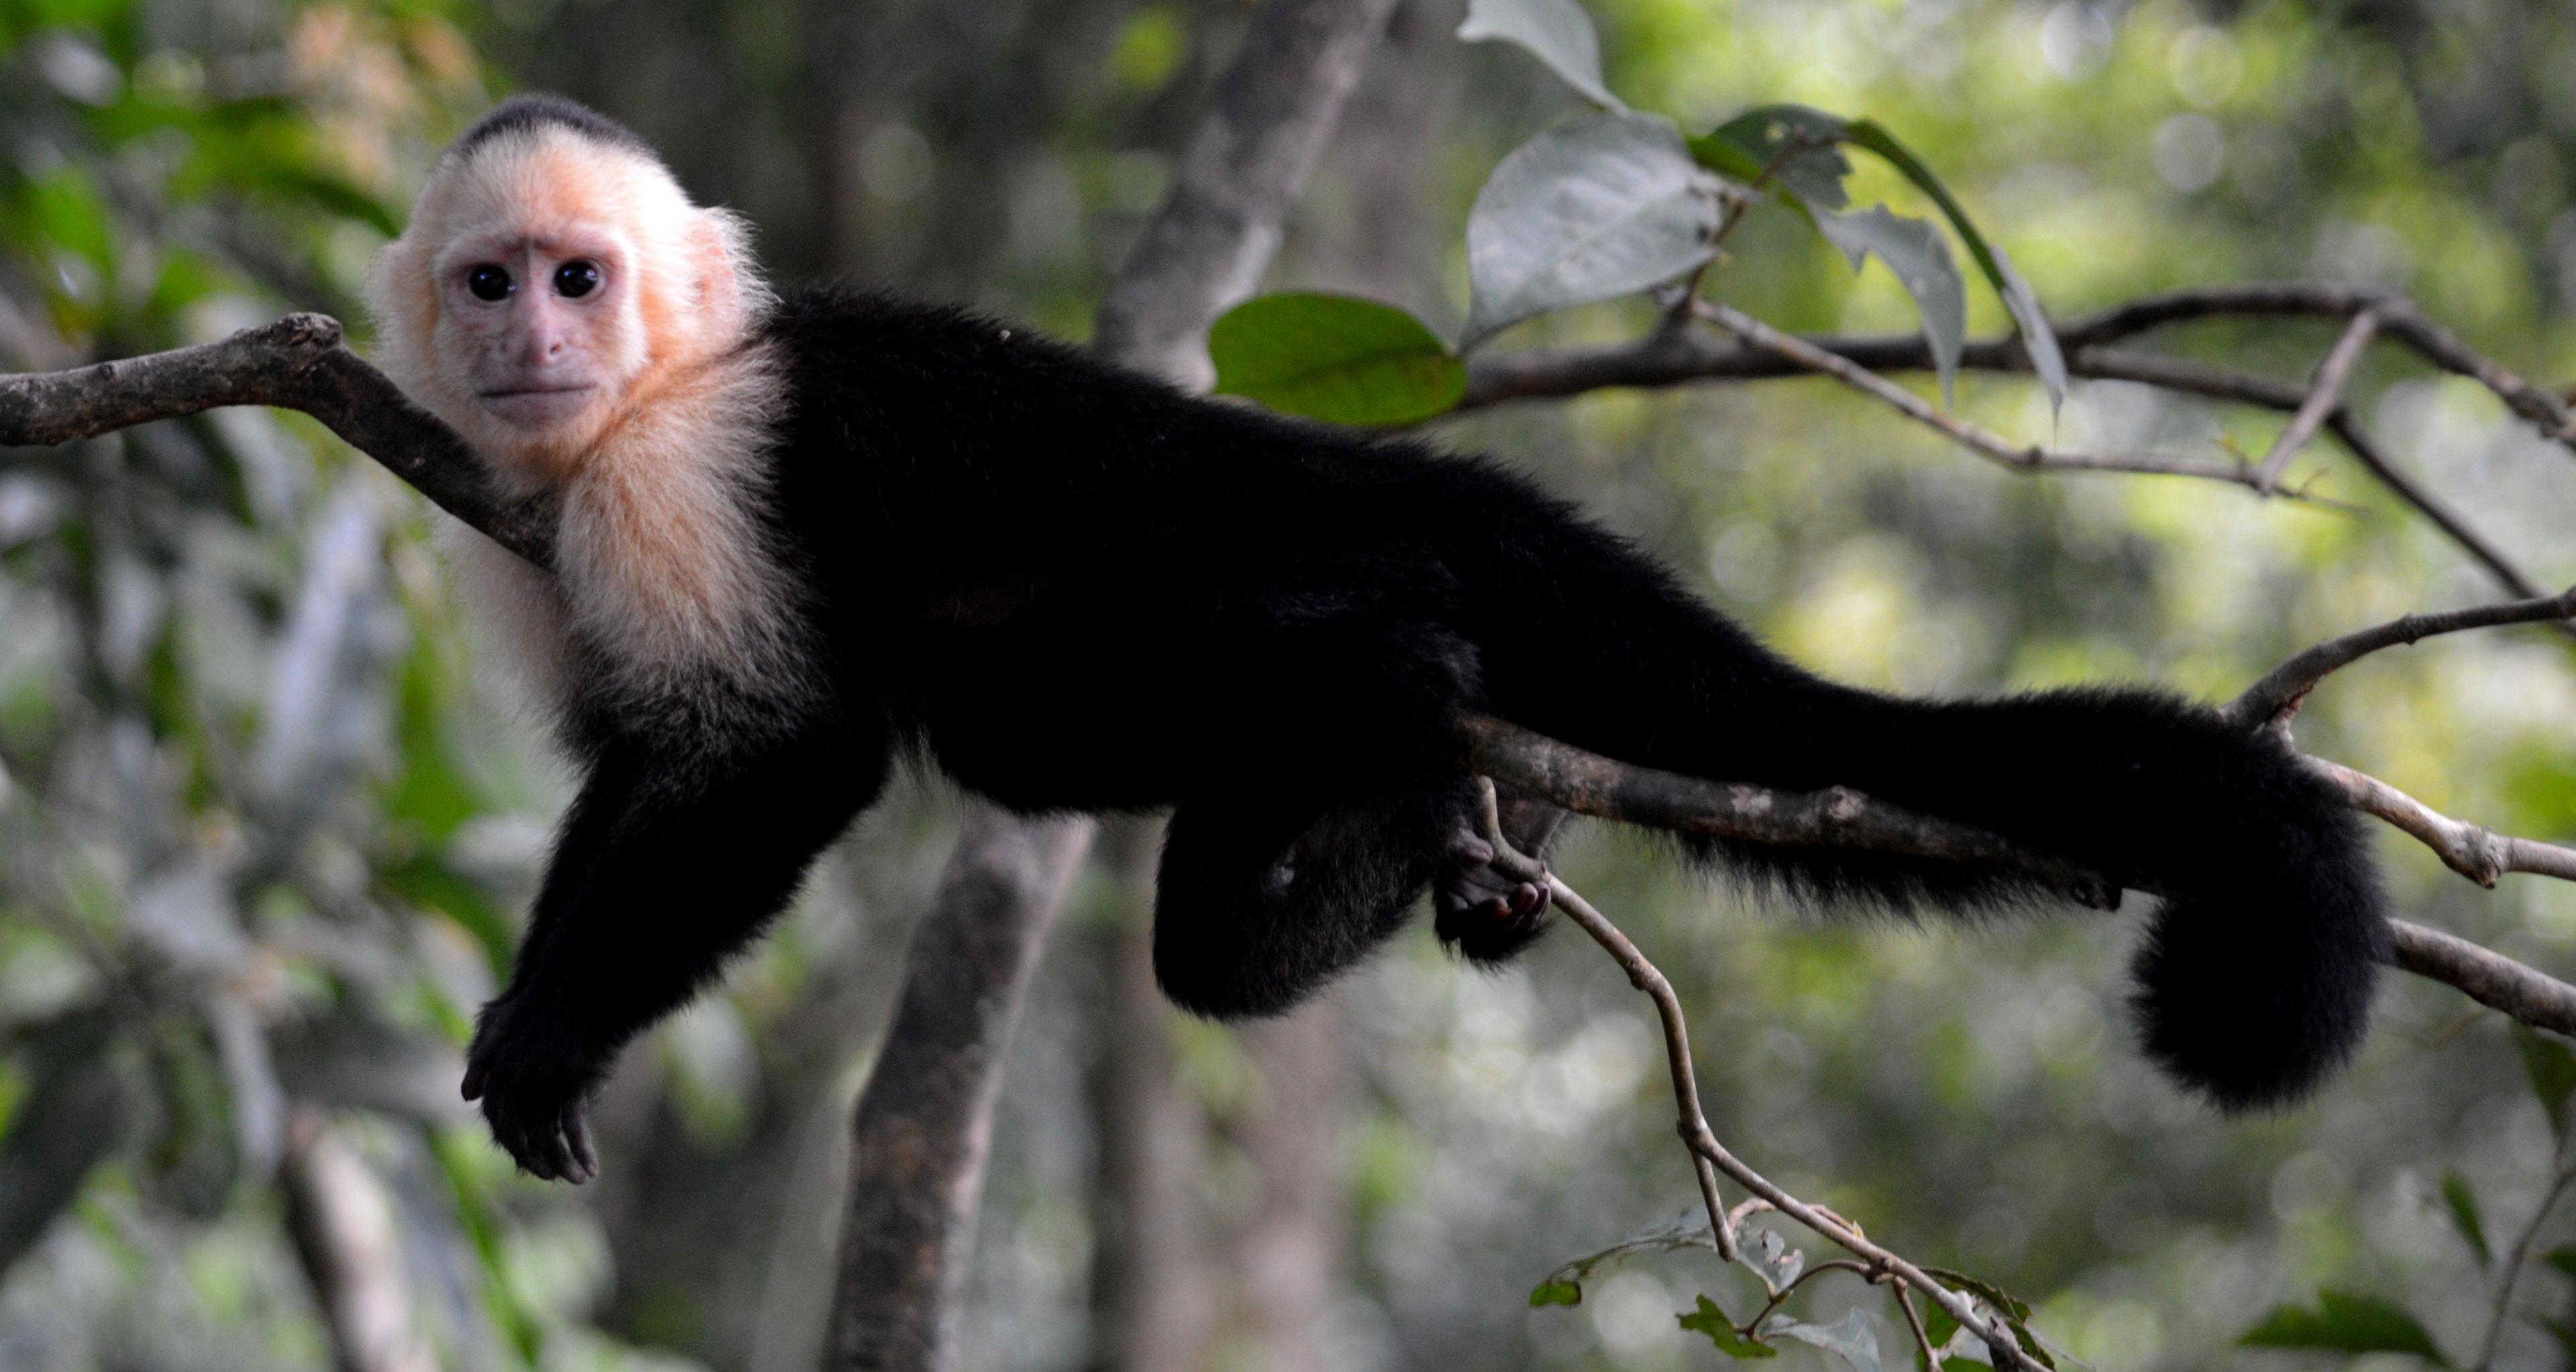 Monkey in a rainforest